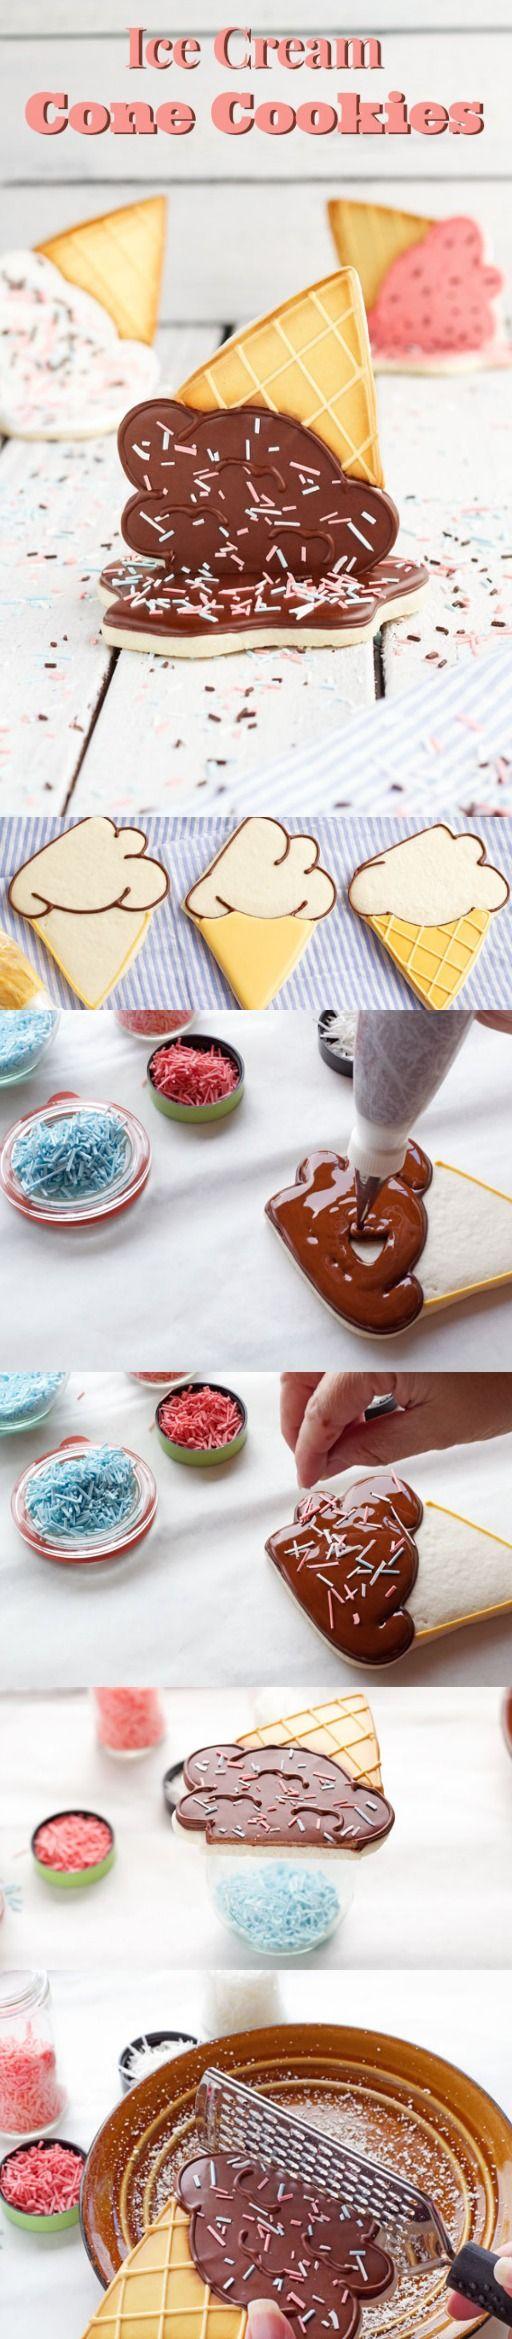 How to Make Ice Cream Cone Cookies www.thebearfootbaker.com.jpg